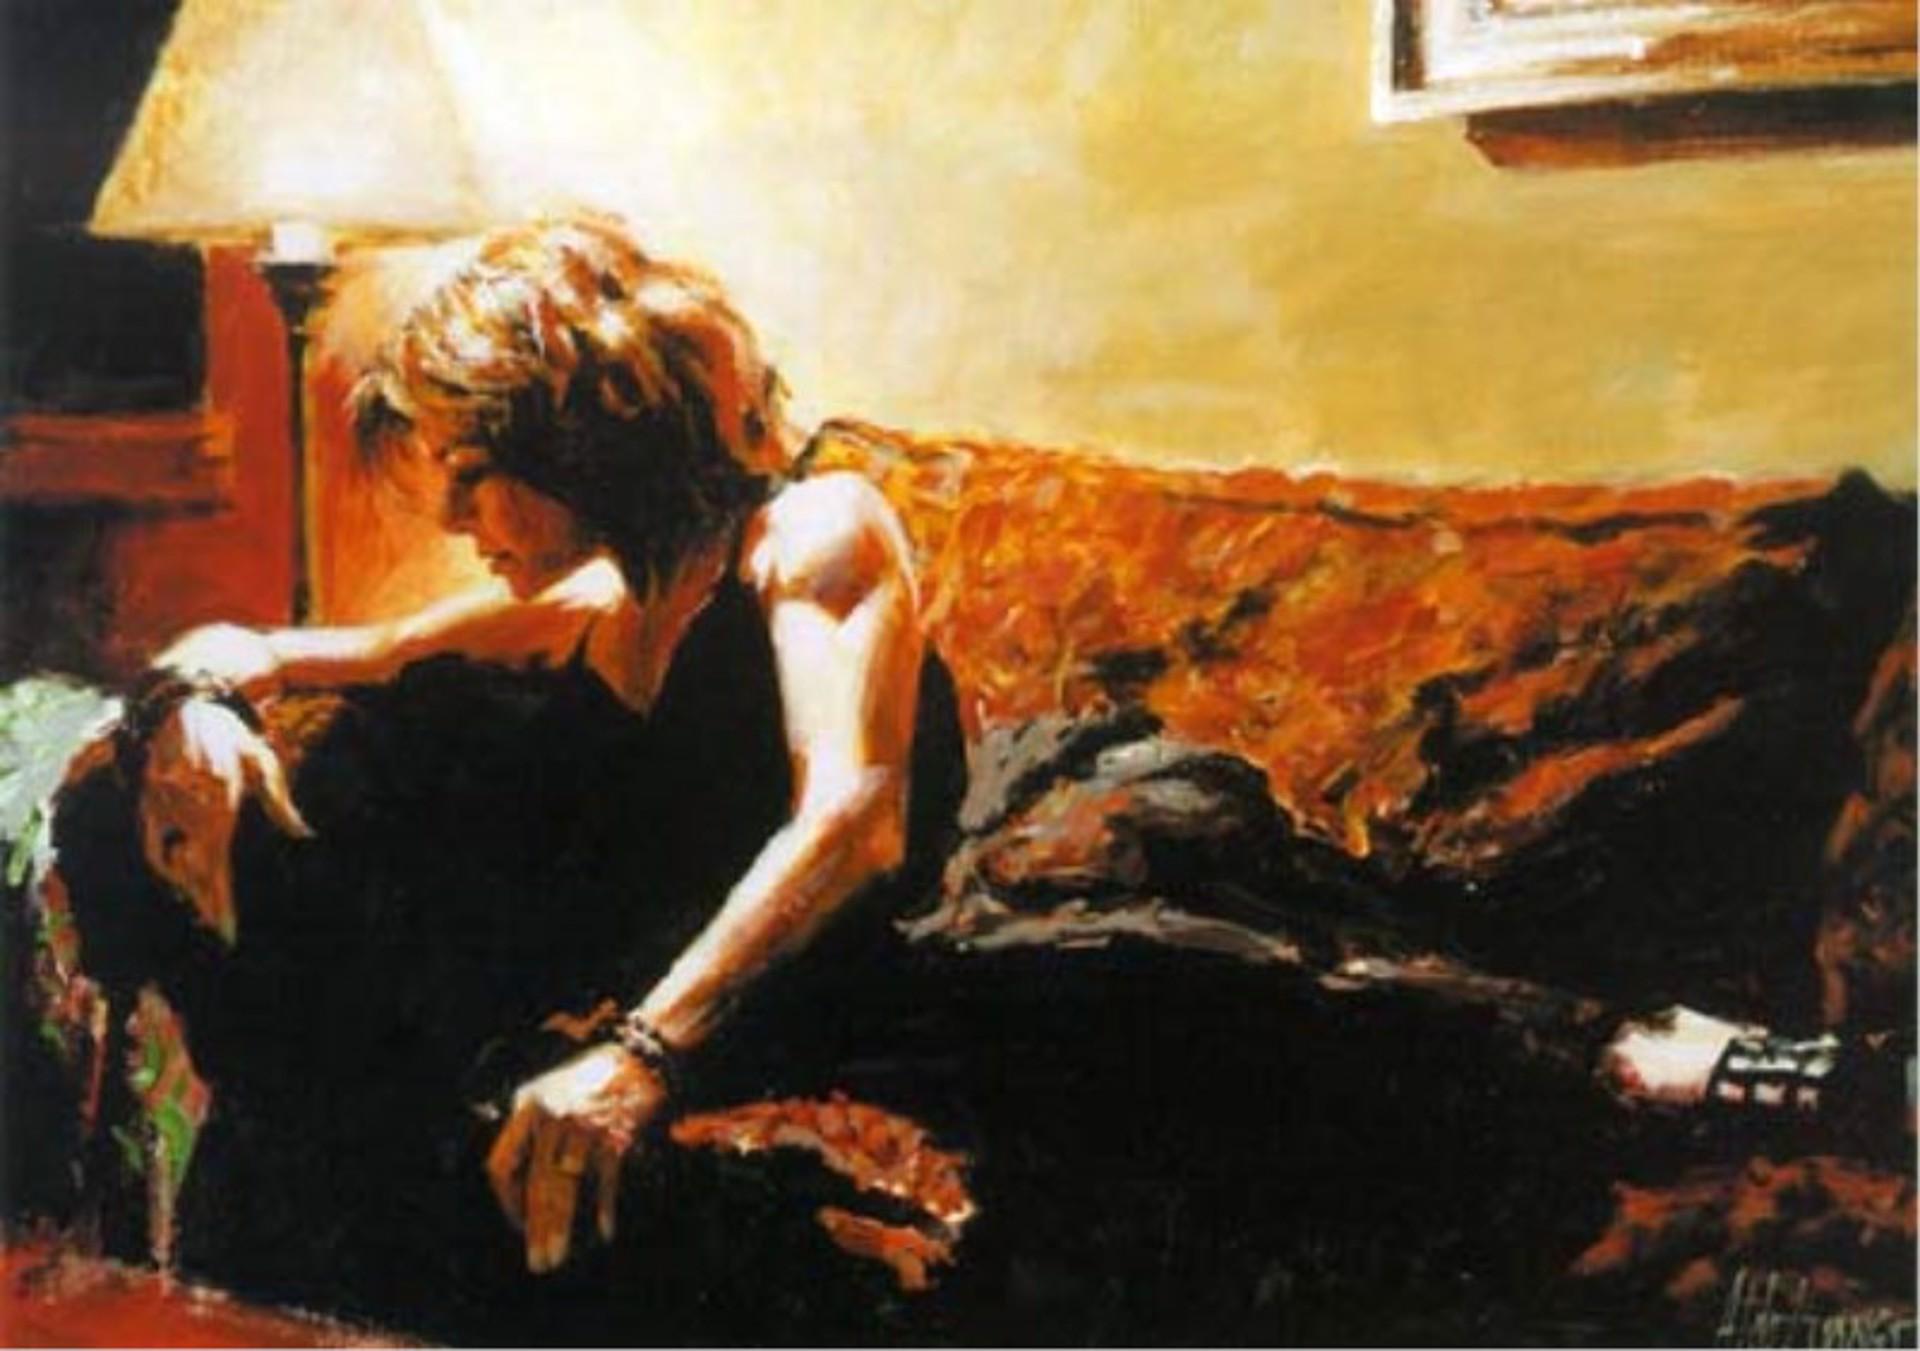 Silhouette by Aldo Luongo